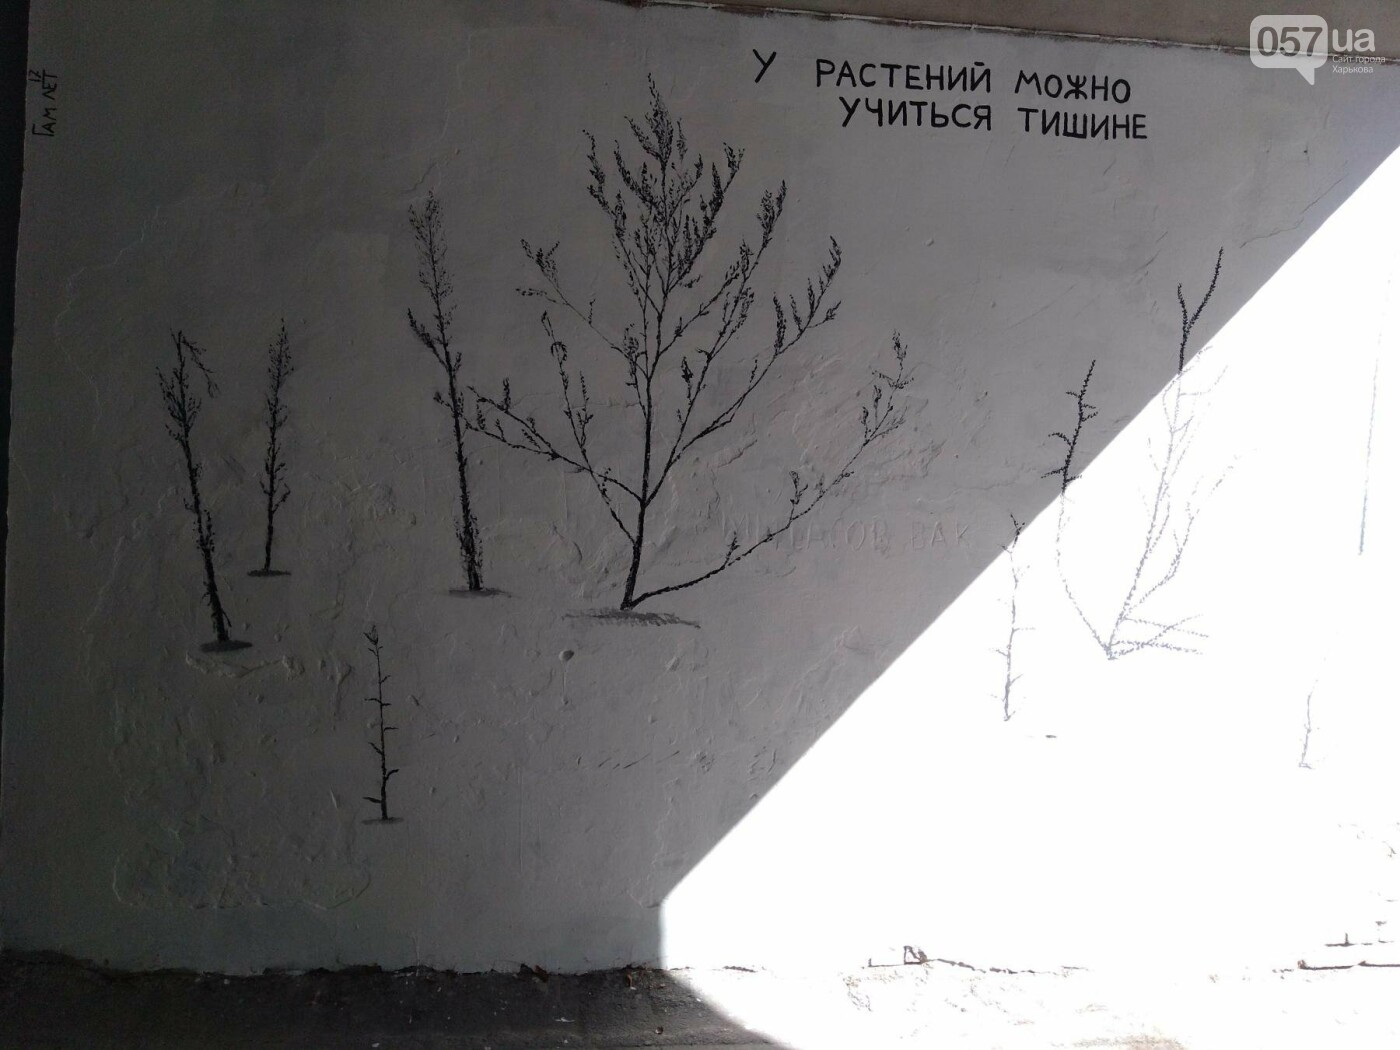 Стрит-арт Гамлета в Харькове: ТОП-10 граффити художника, - ФОТО, фото-20